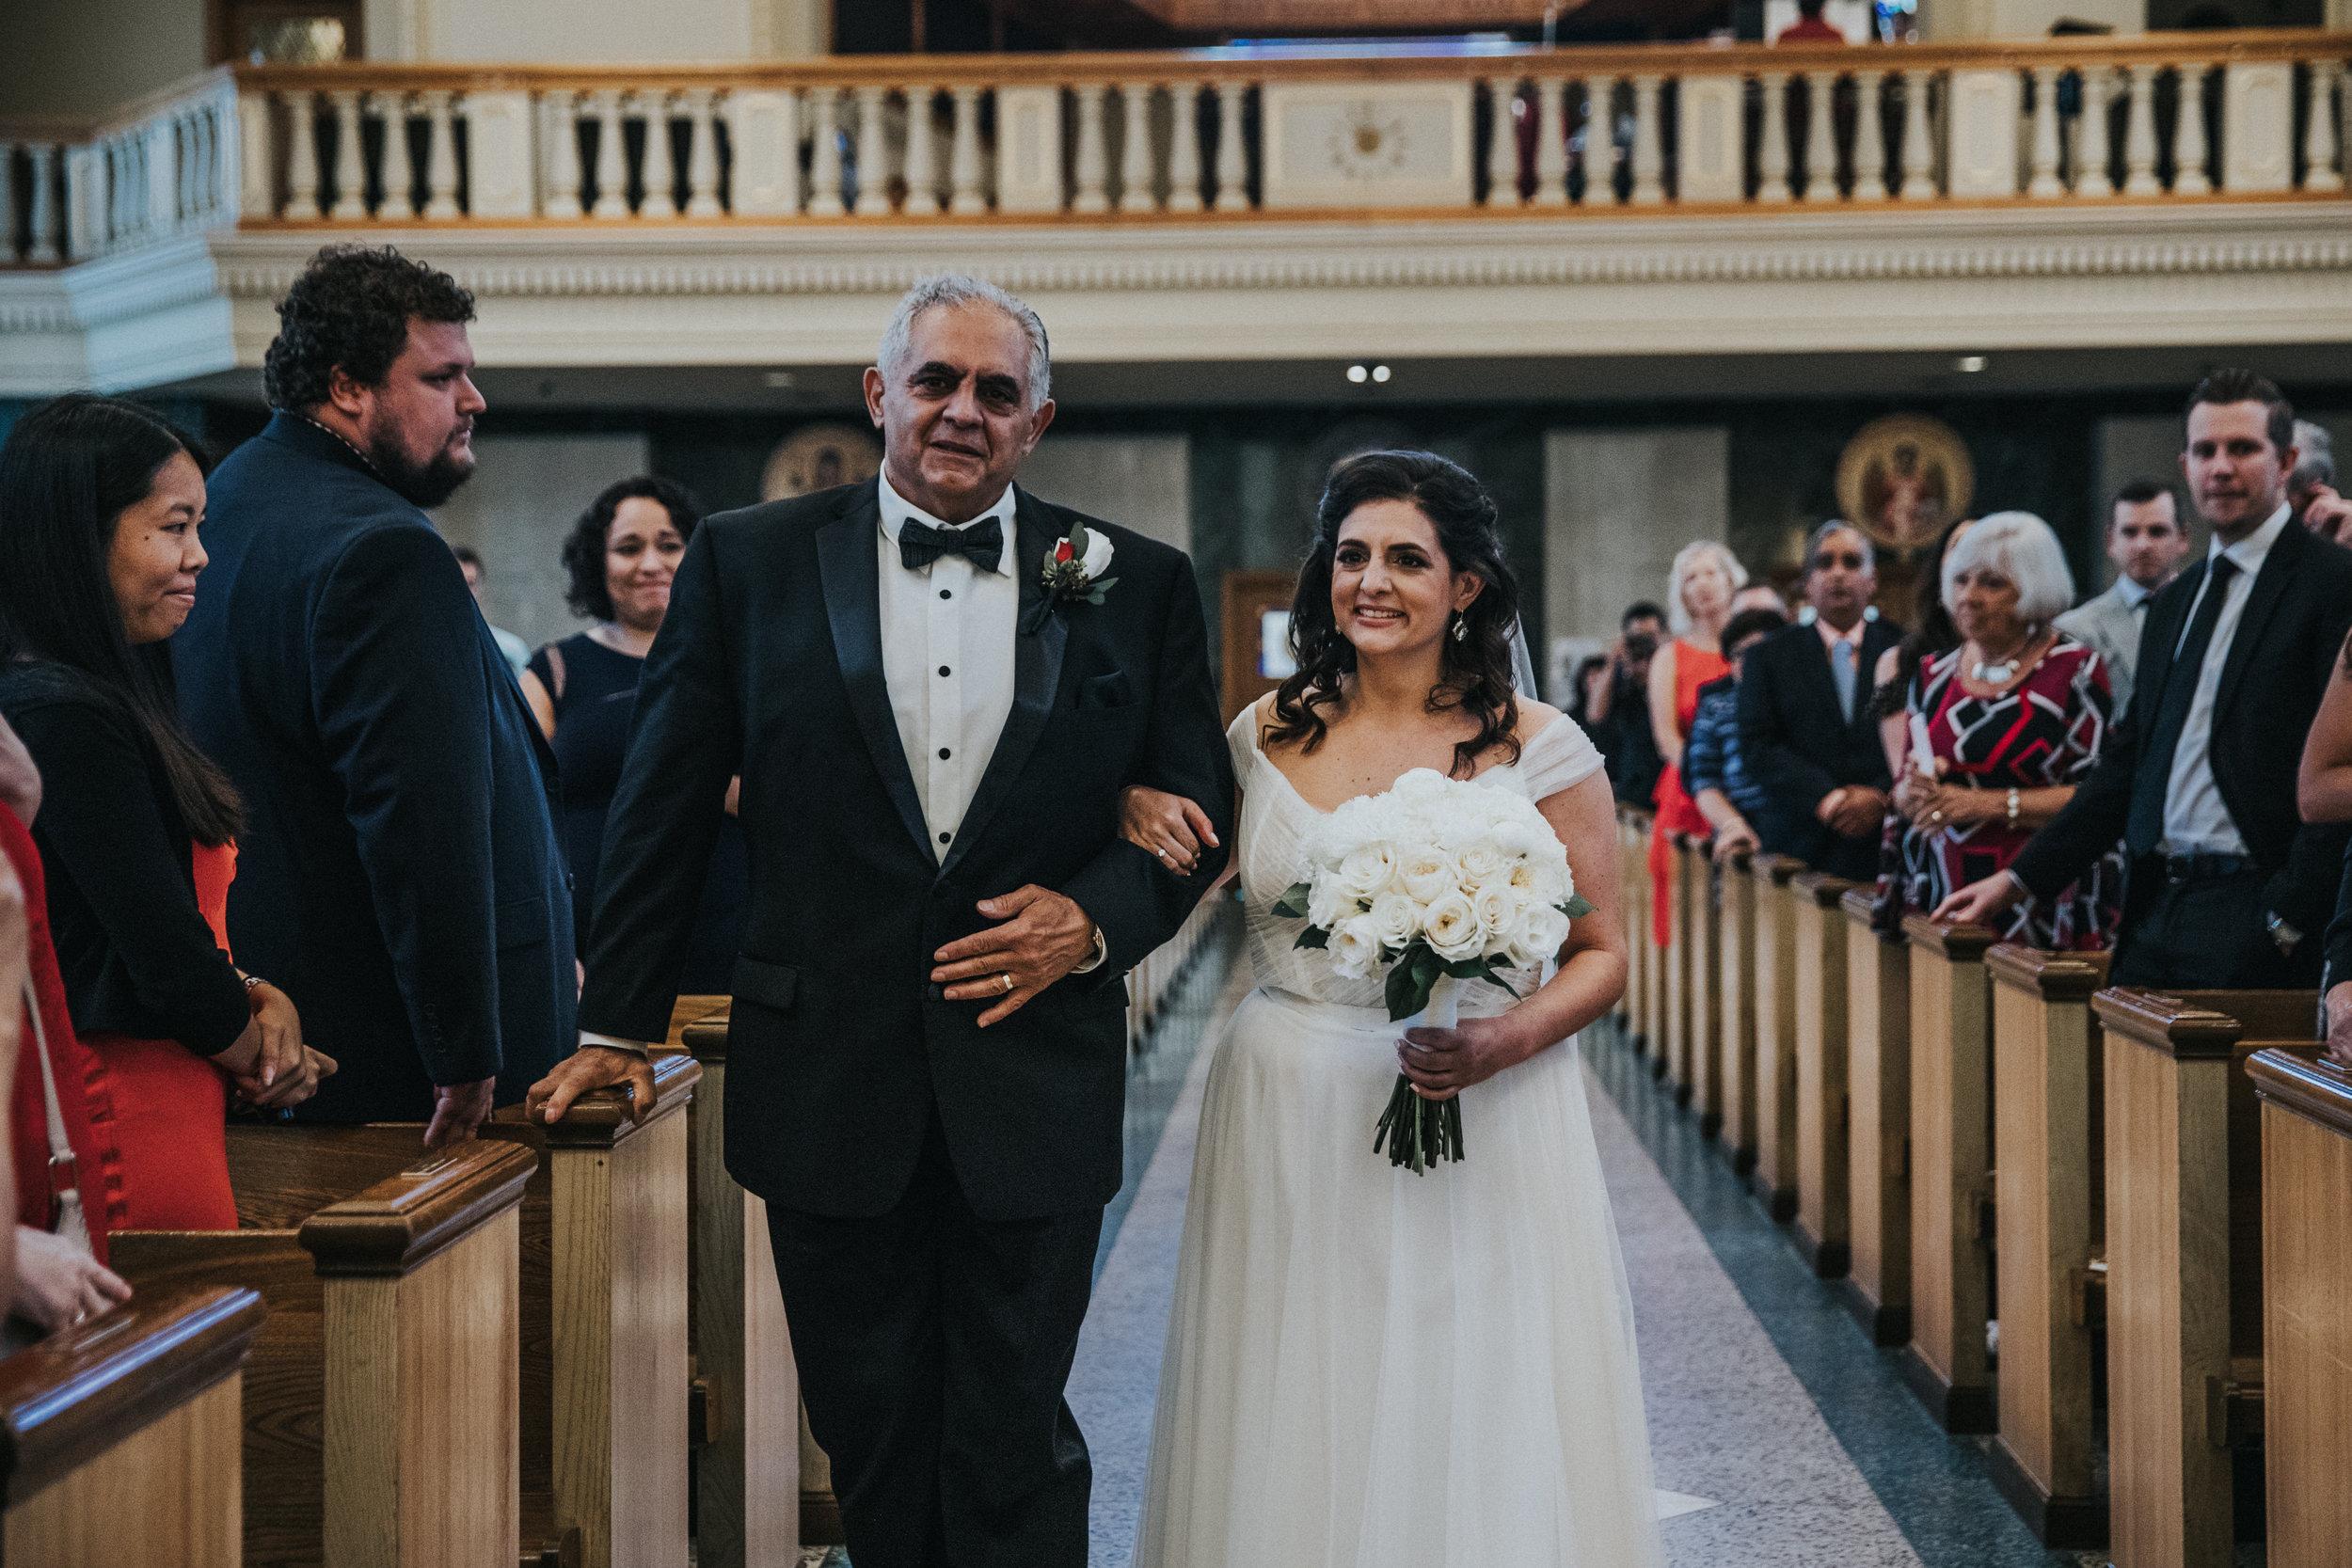 JennaLynnPhotography-NJWeddingPhotographer-Philadelphia-Wedding-ArtsBallroom-Ceremony-27.jpg